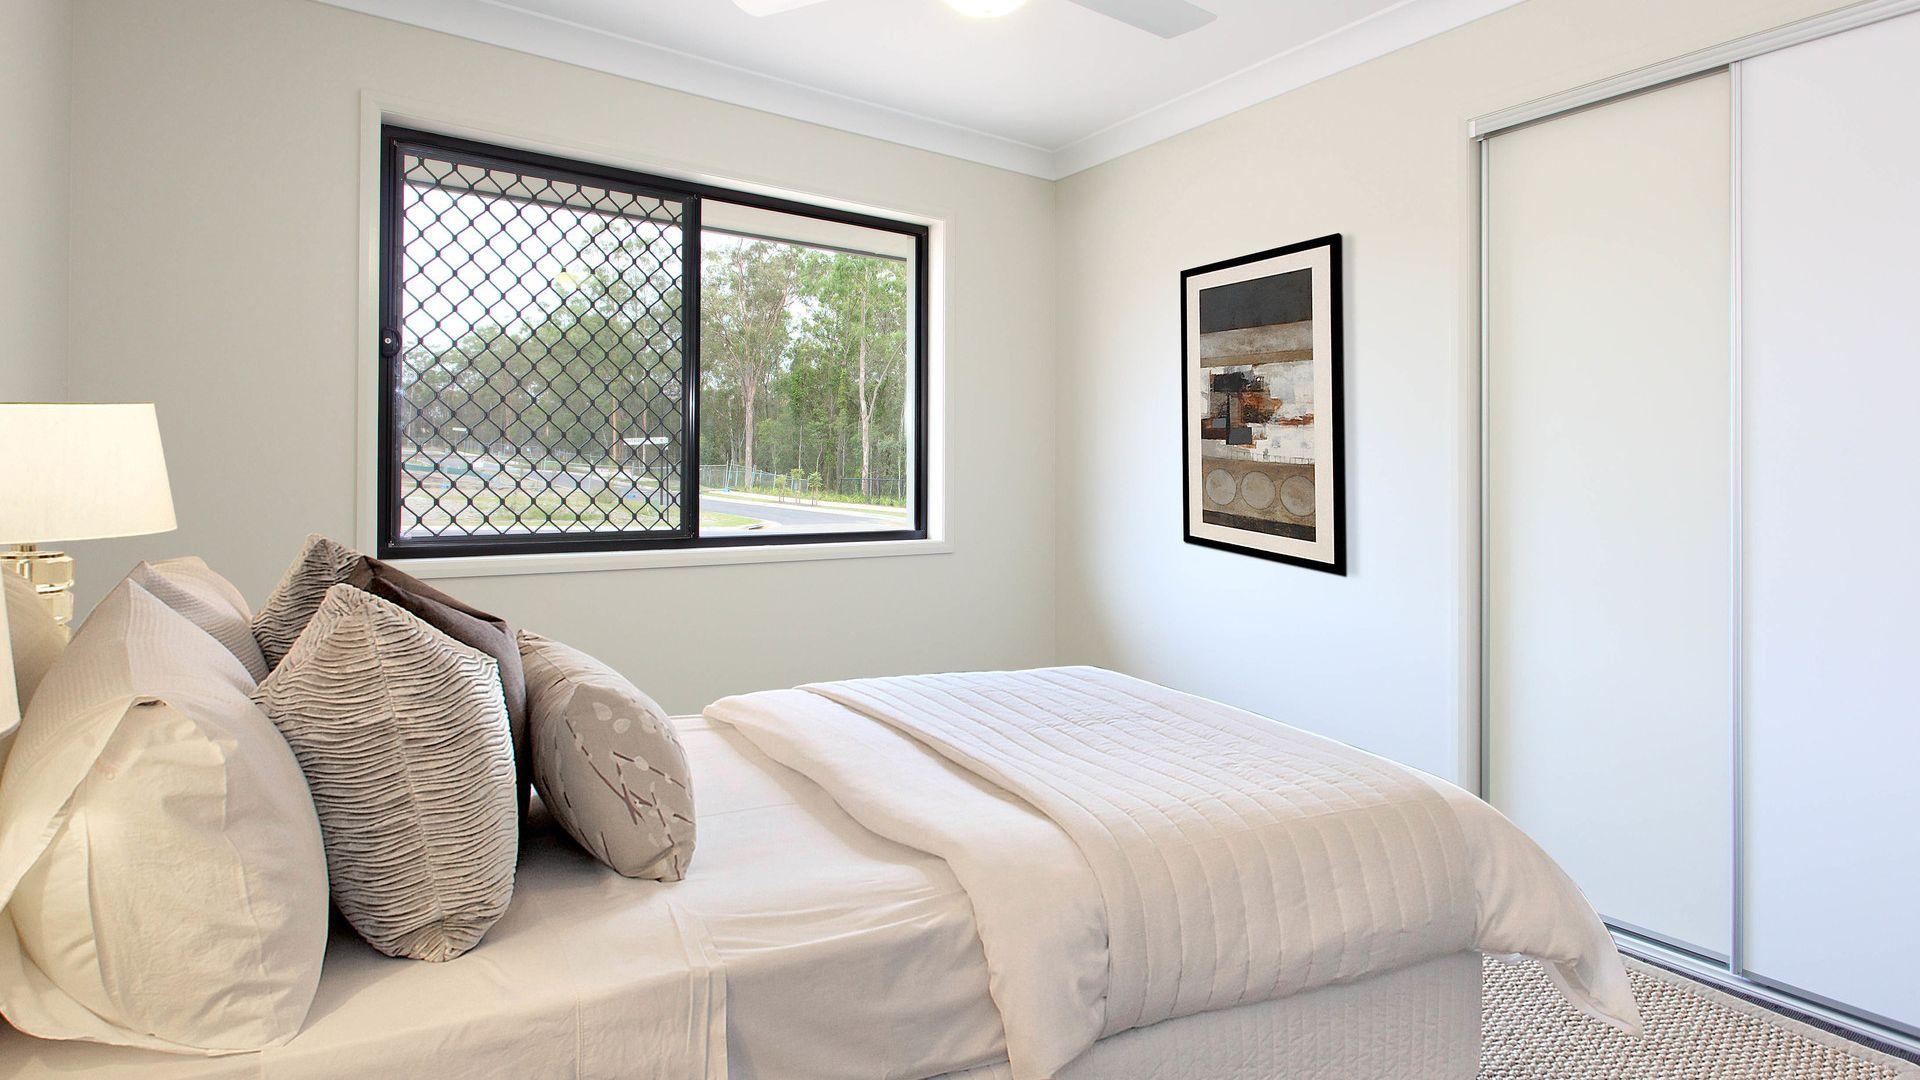 Lot 130 Hayfield Estate, Ripley QLD 4306, Image 1